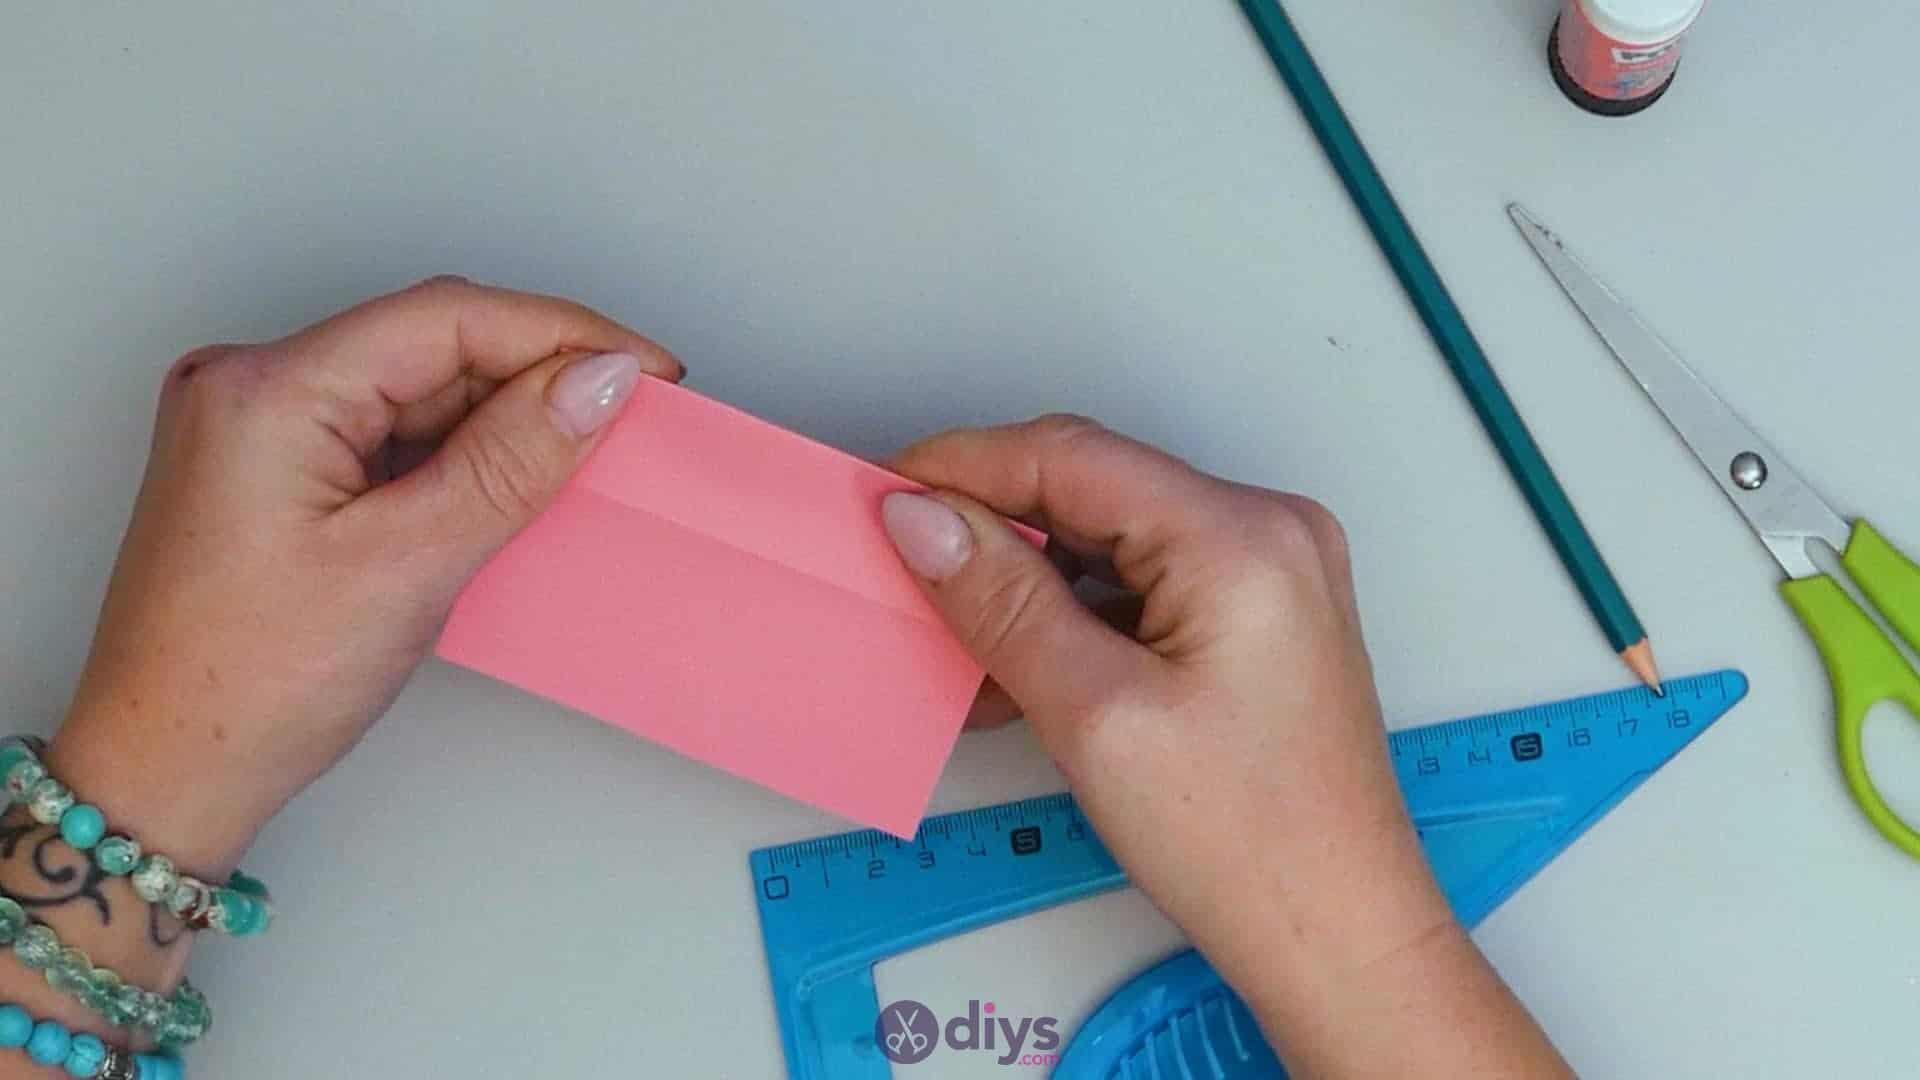 Diy lipstick gift card step 6